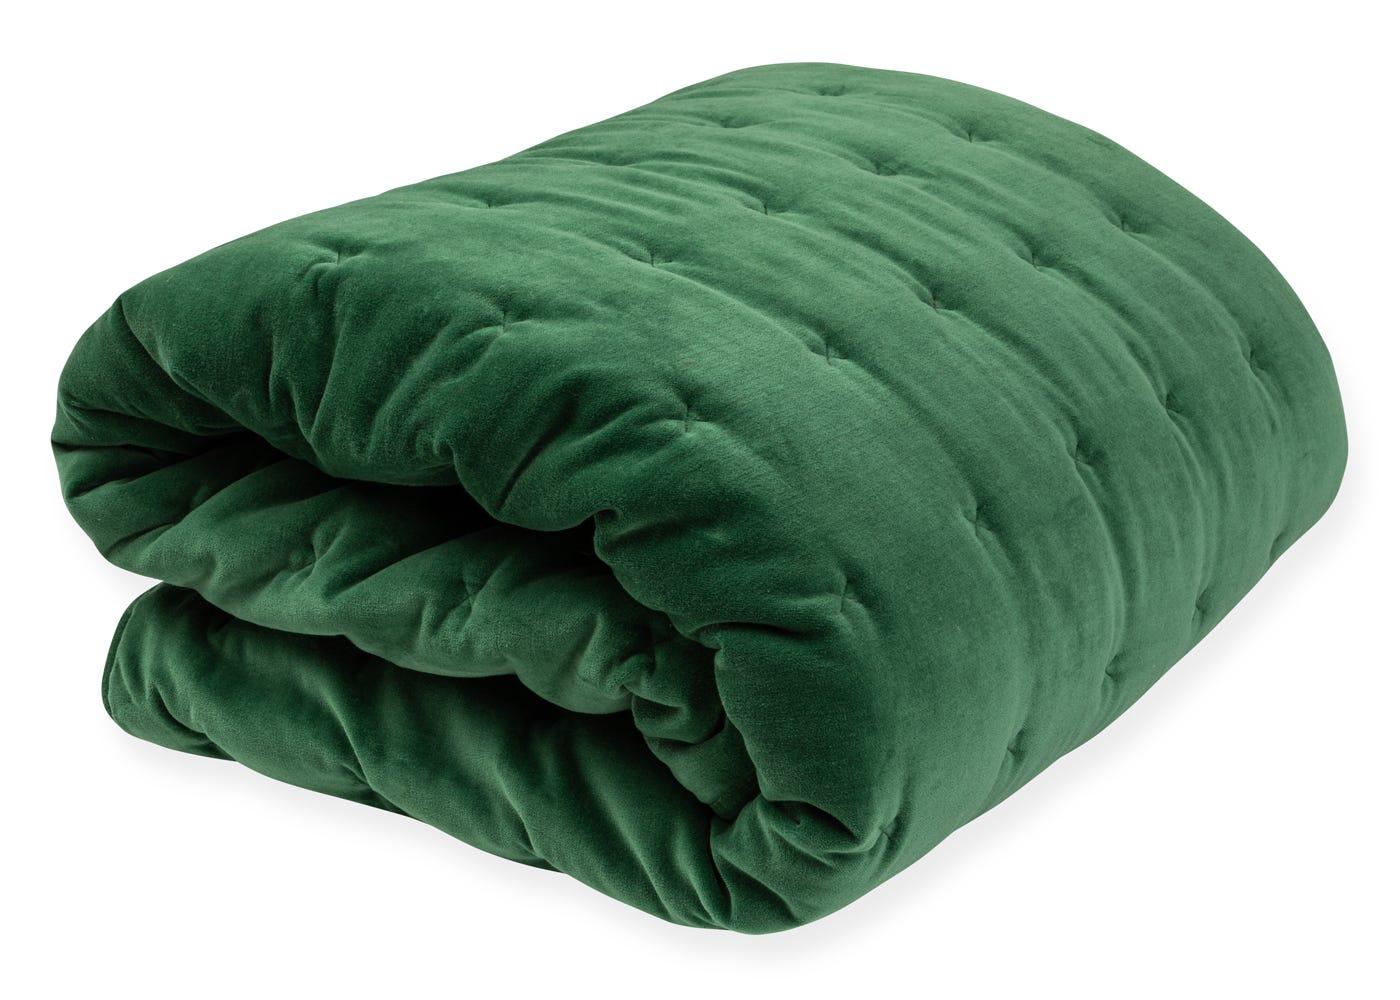 Heal's Velvet Quilt Emerald Green 140 x 200cm